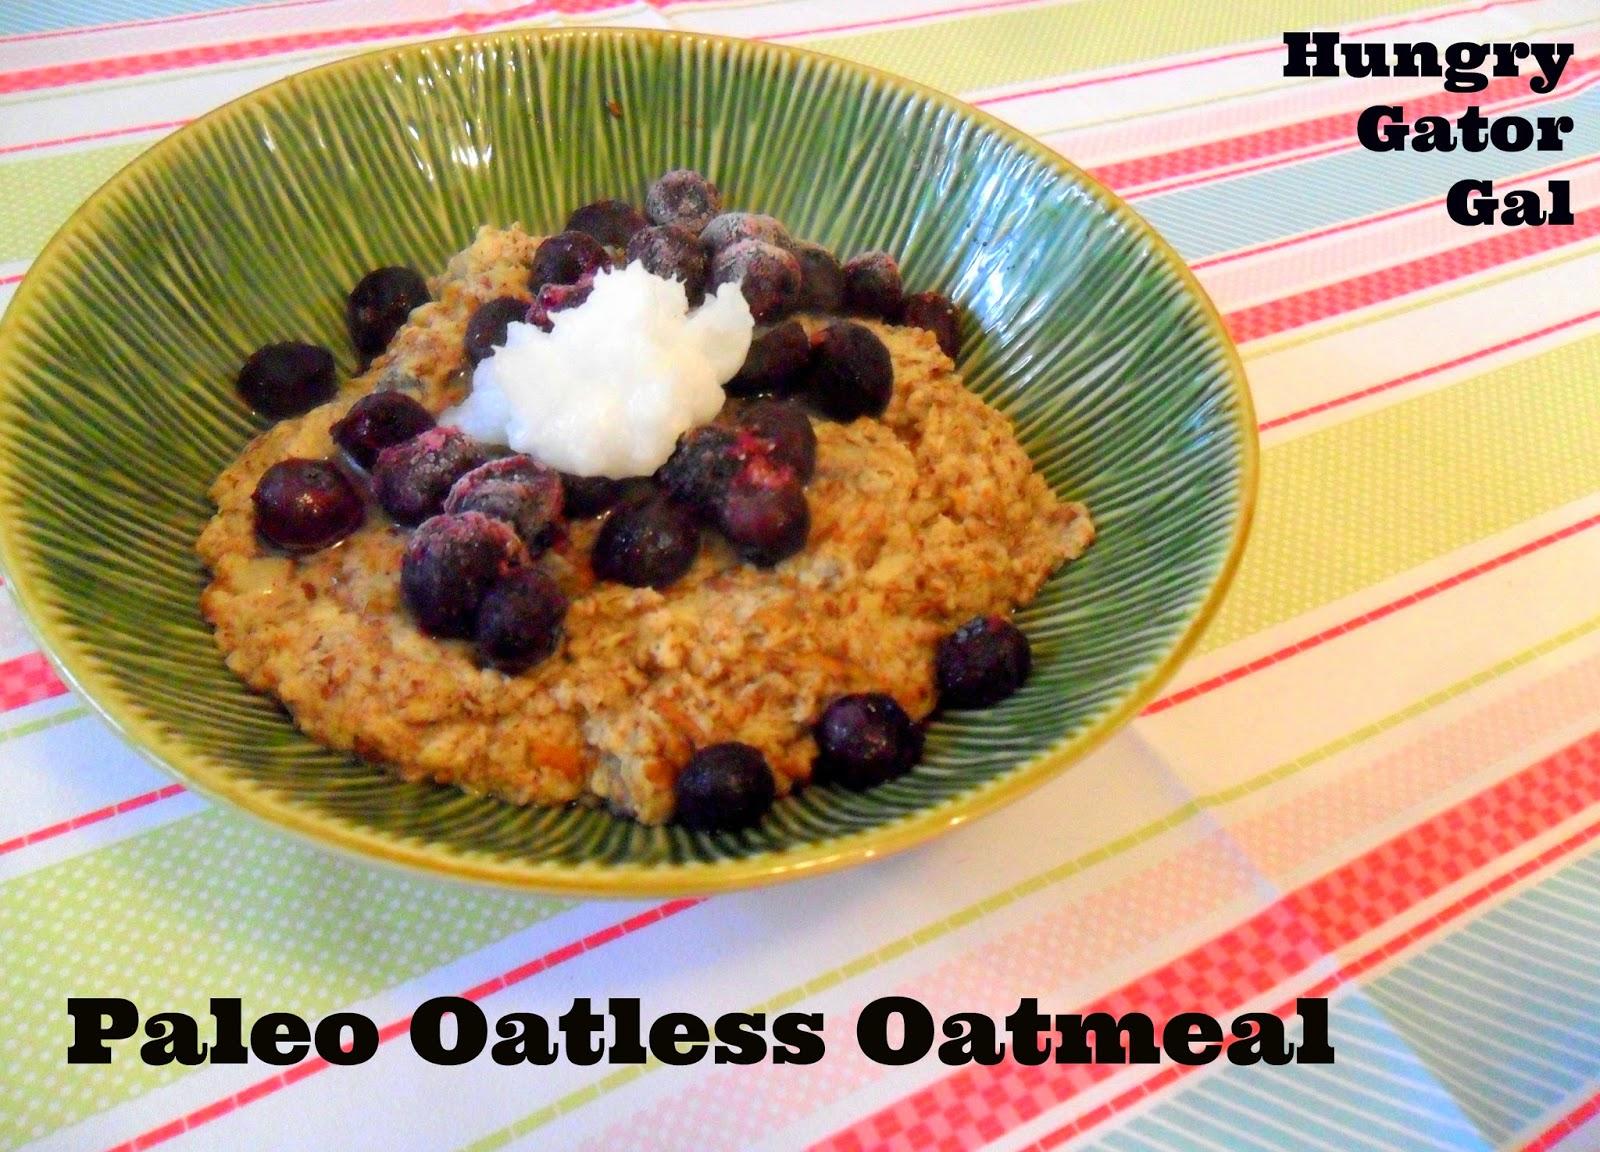 Paleo Oatless Oatmeal from Hungry Gator Gal